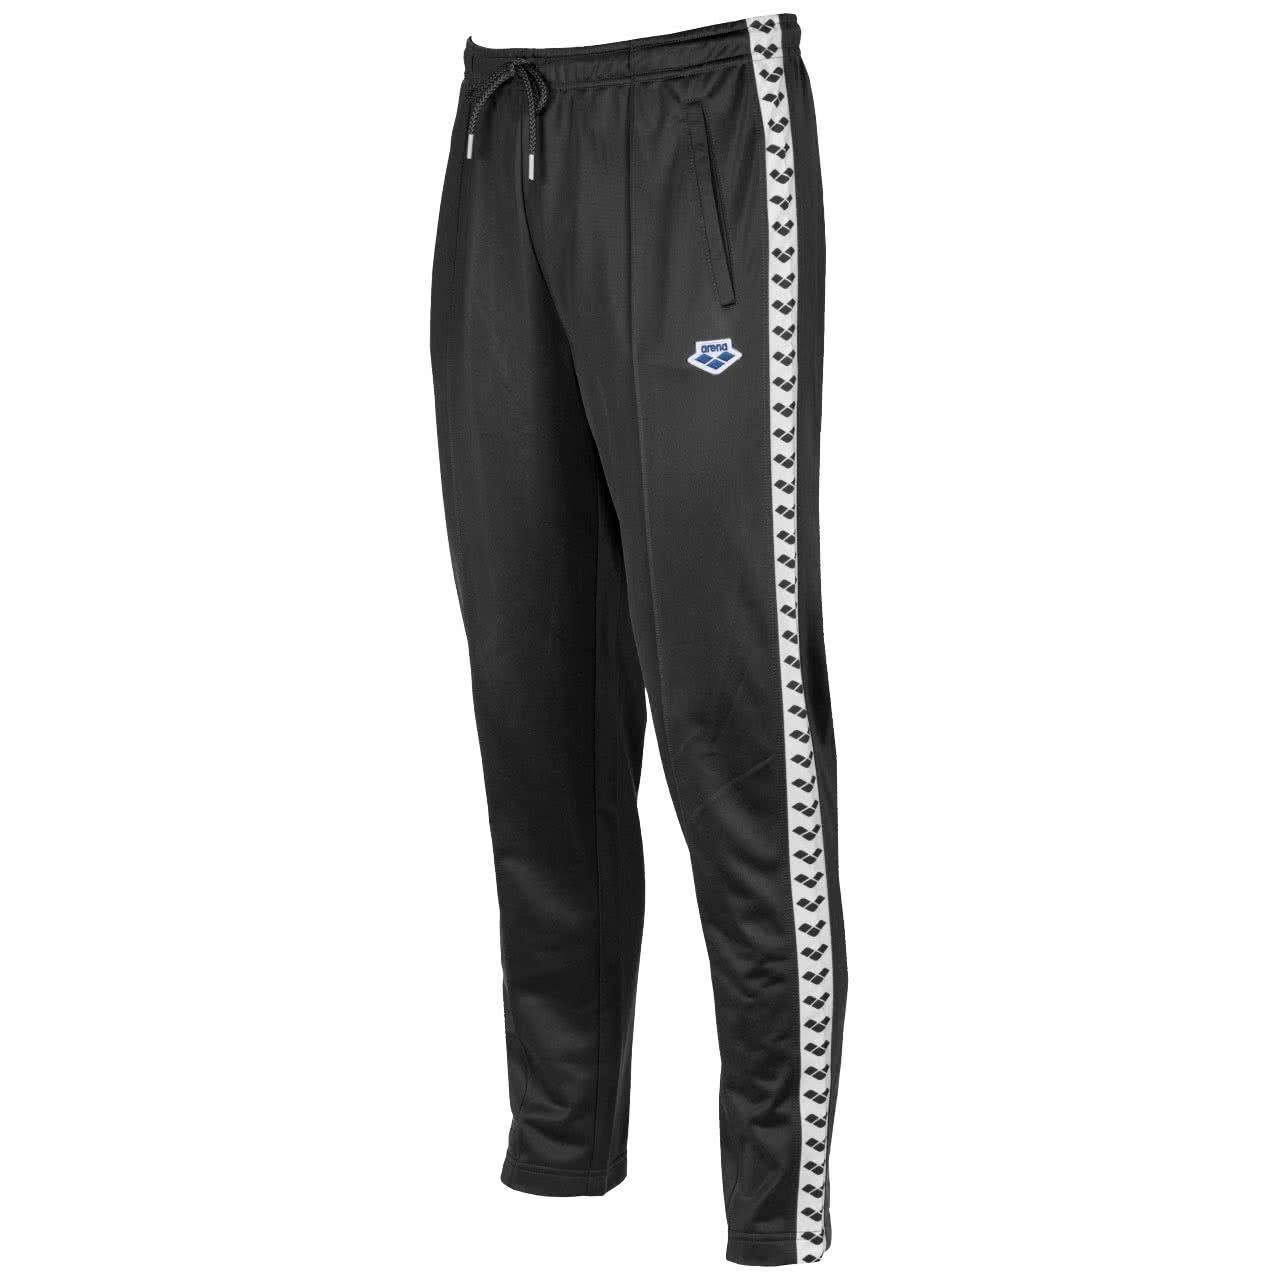 Arena Relax IV Team Pants Men schwarz-Weiß-schwarz 2018 Hose lang